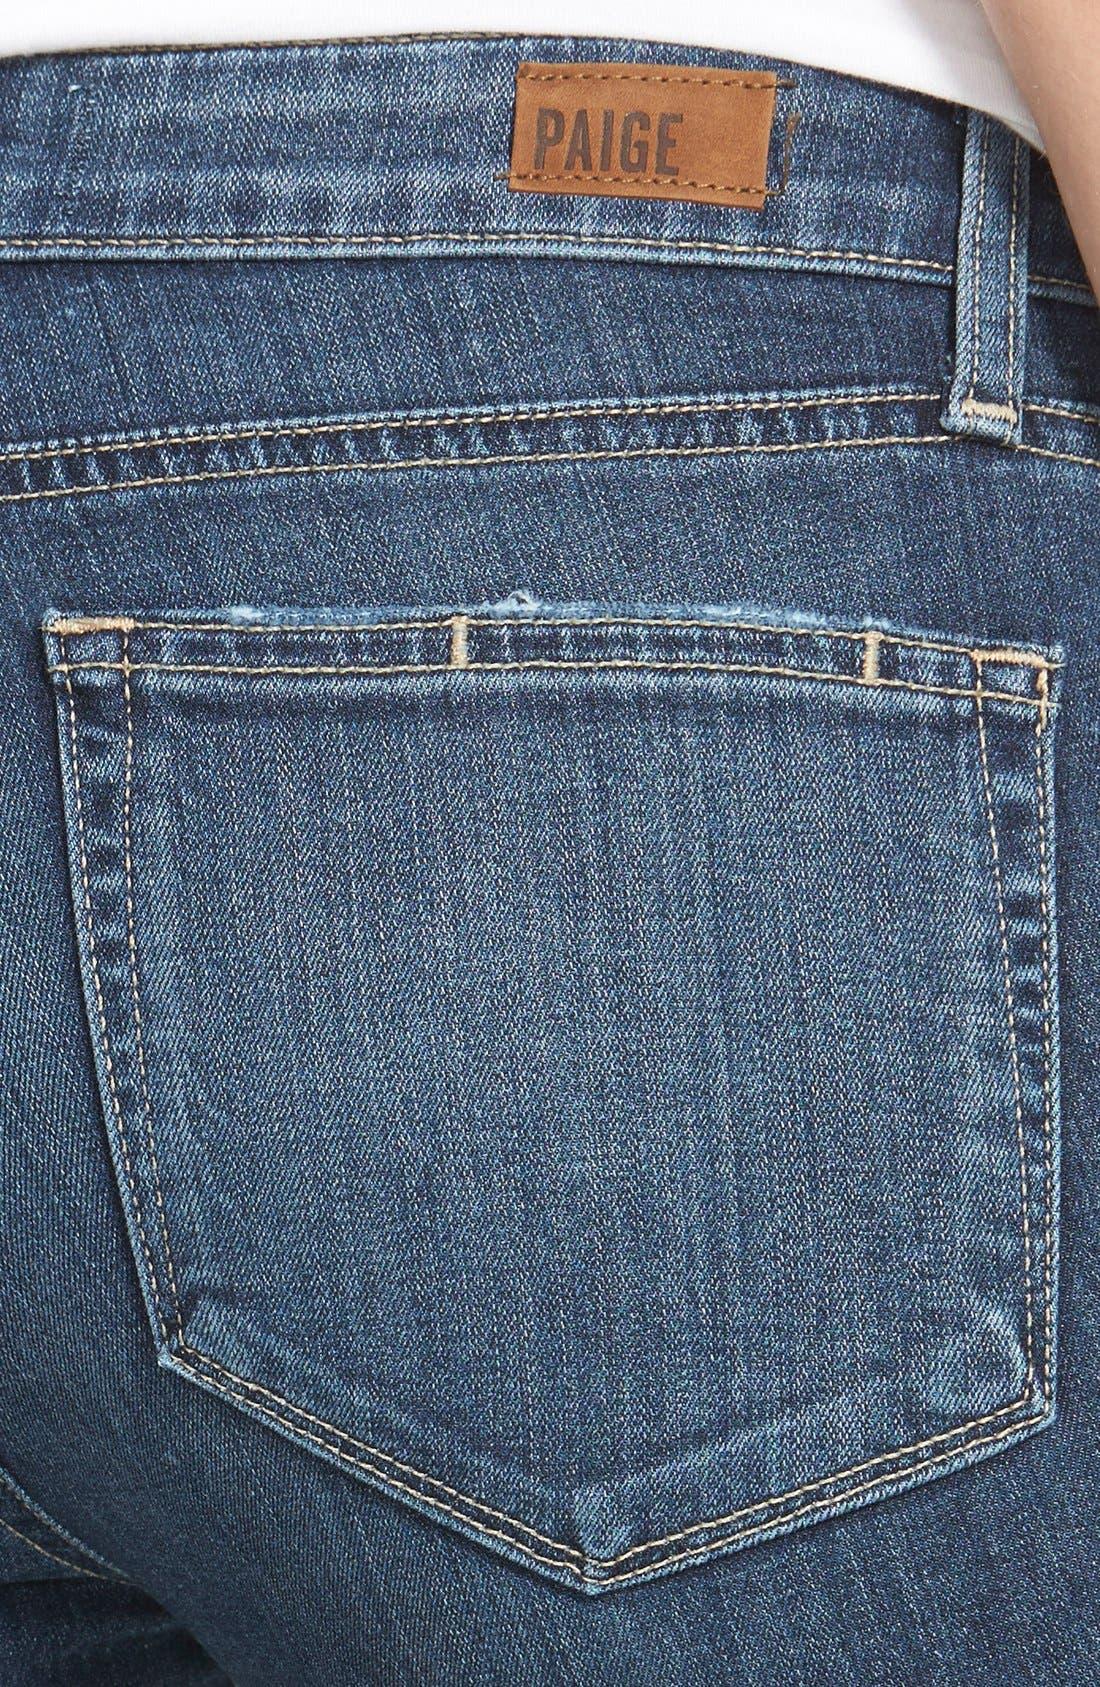 Alternate Image 2  - Paige Denim 'Transcend - Verdugo' Ultra Skinny Jeans (Quinnley Destructed)